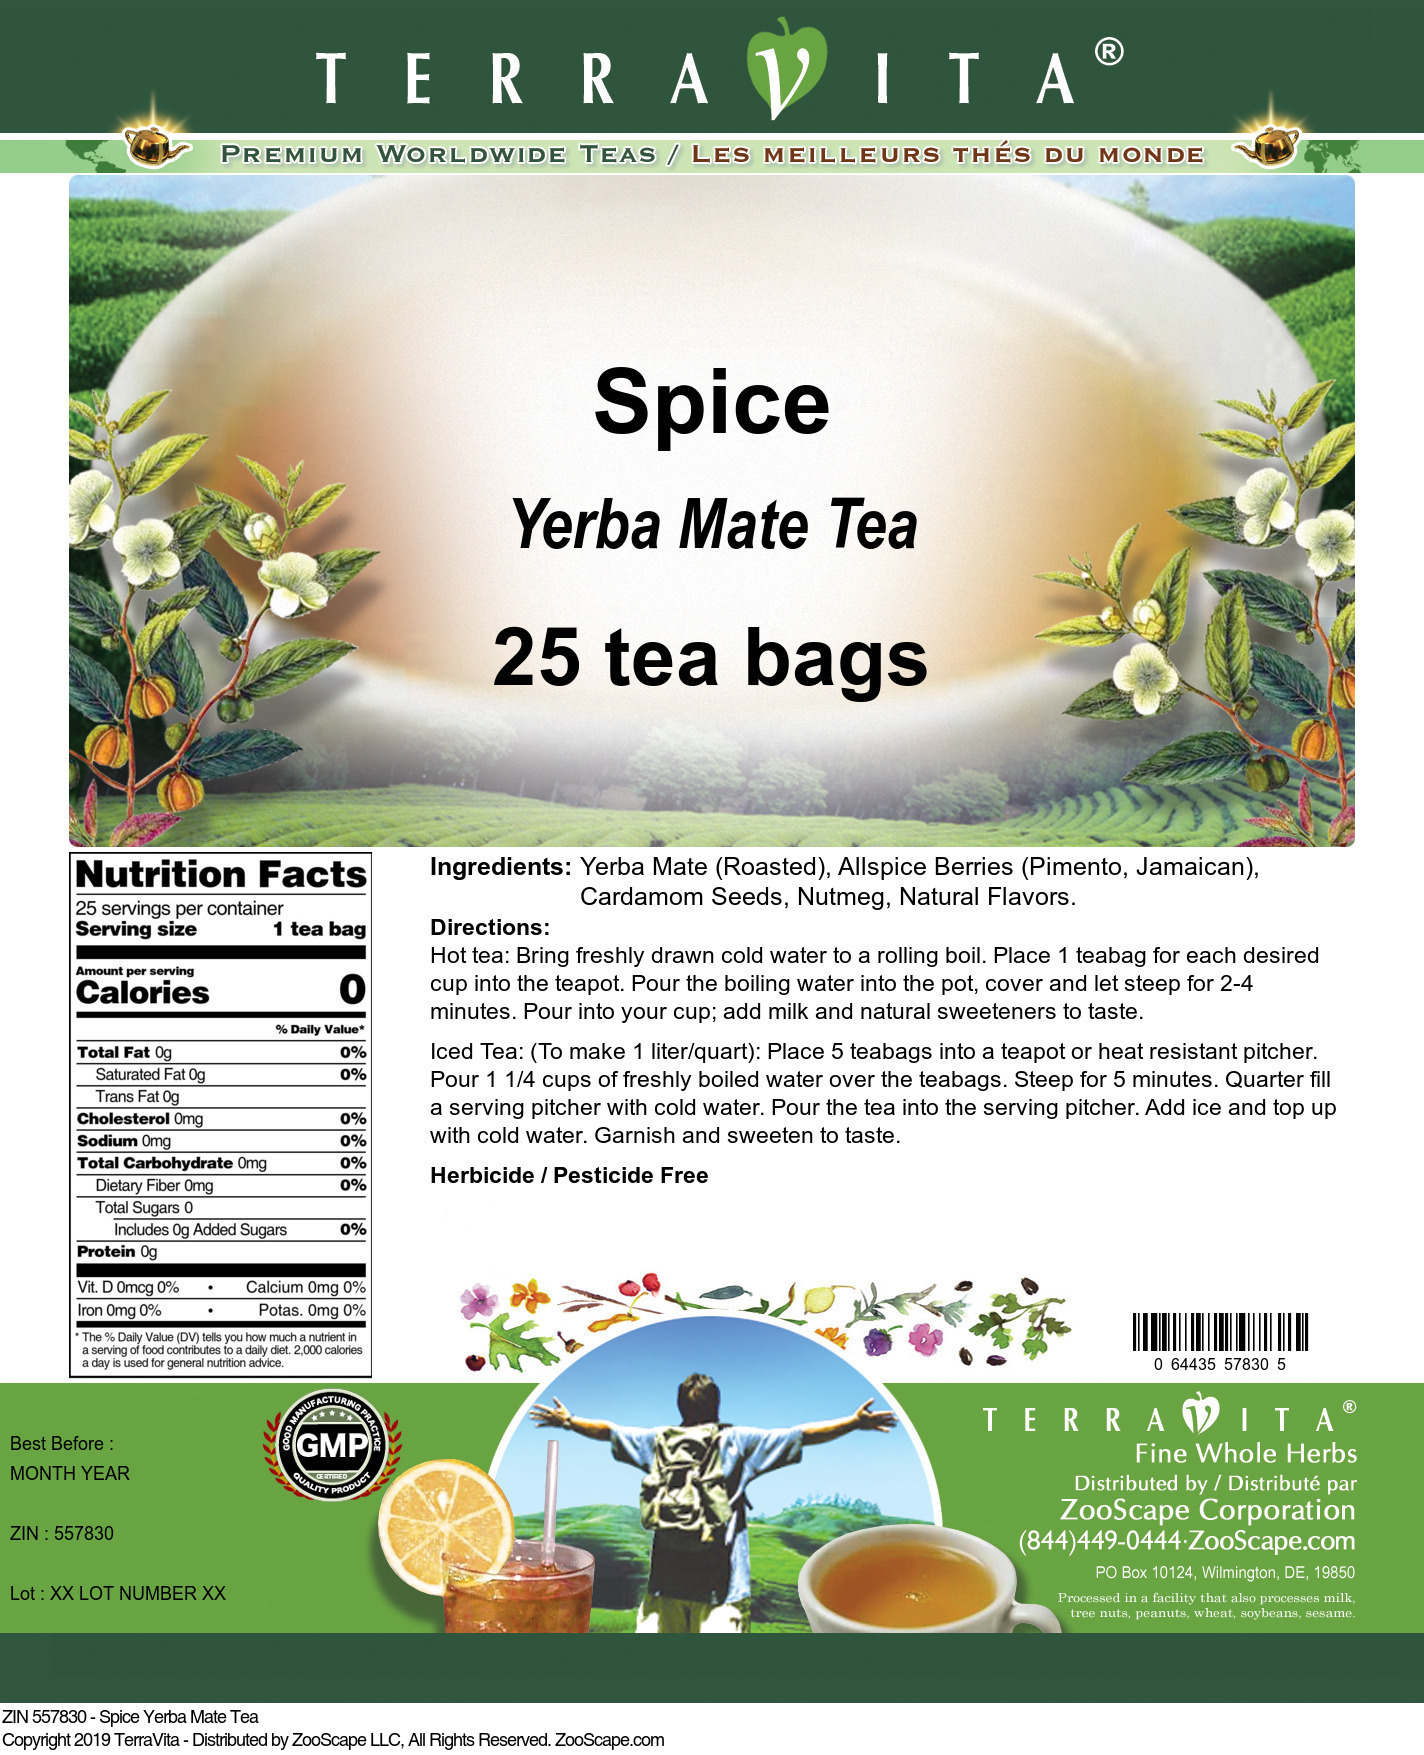 Spice Yerba Mate